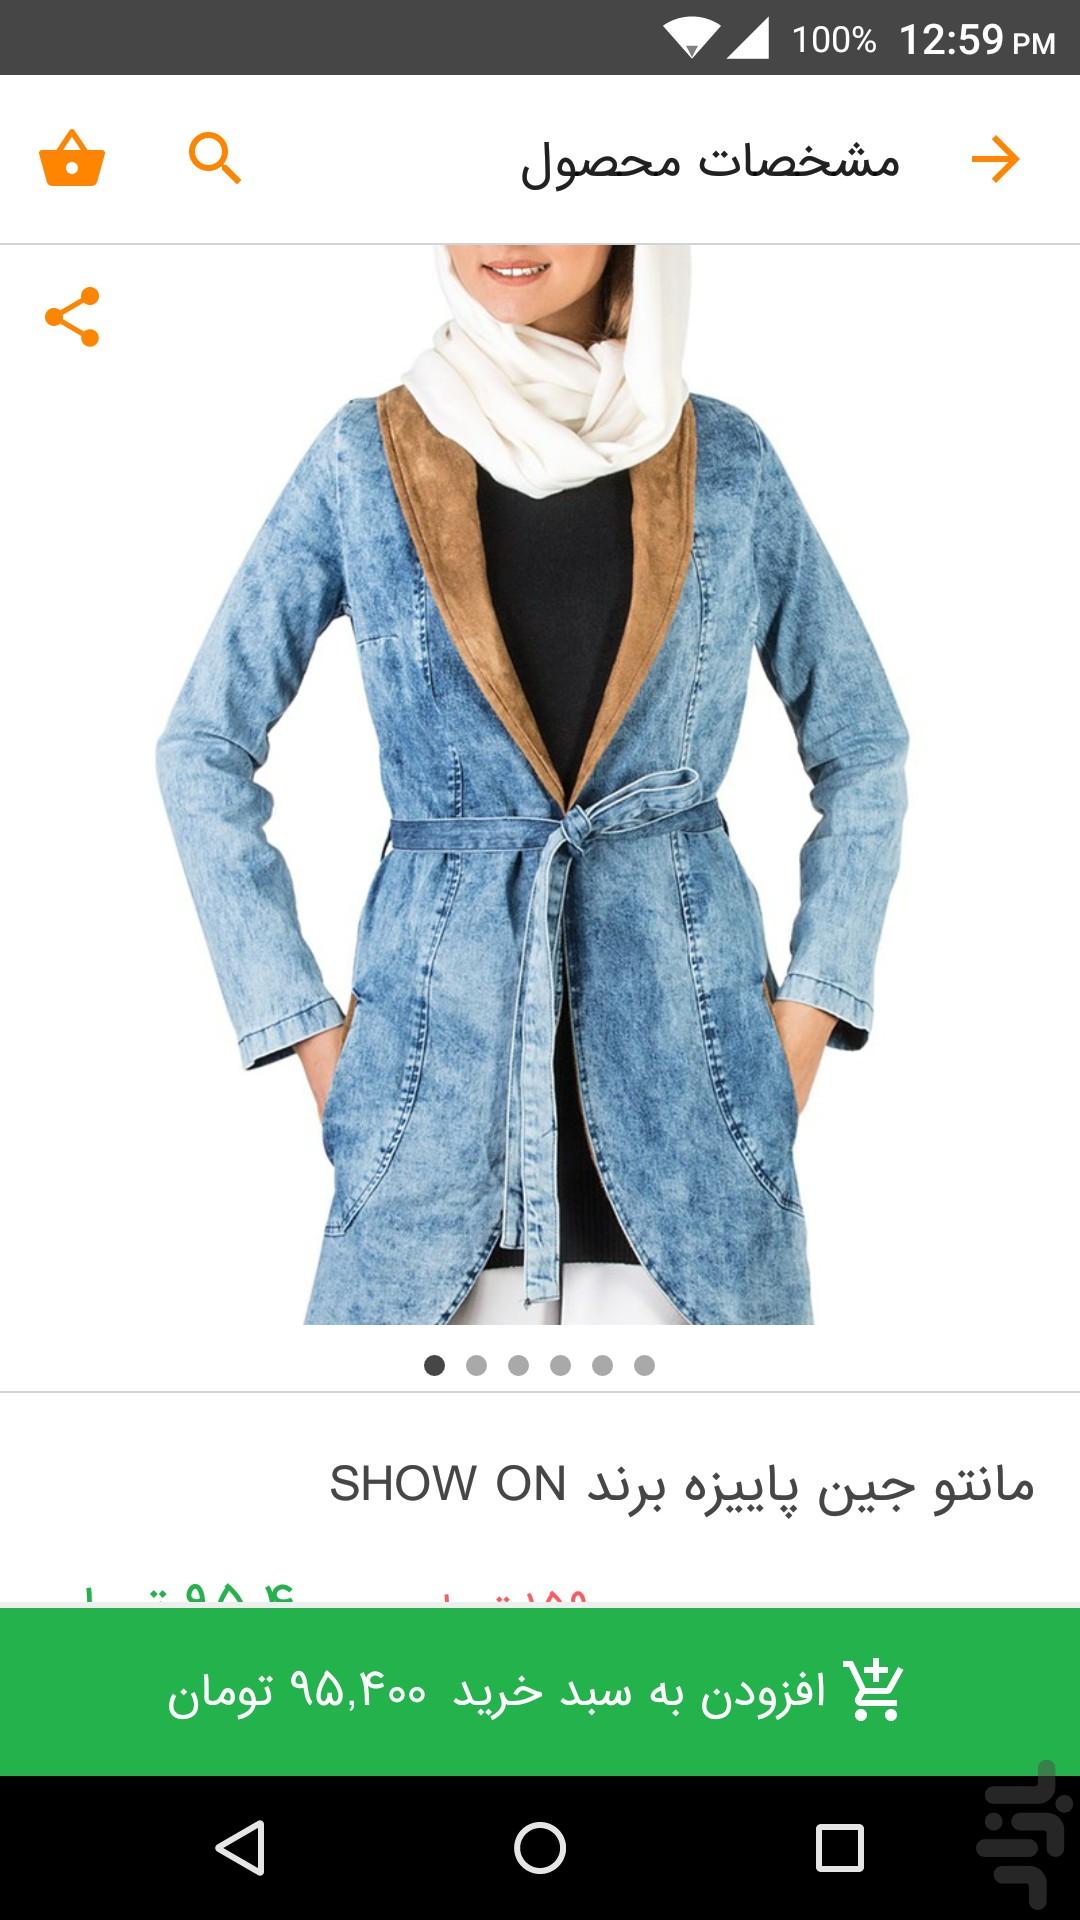 فروش لباس تاناکورا